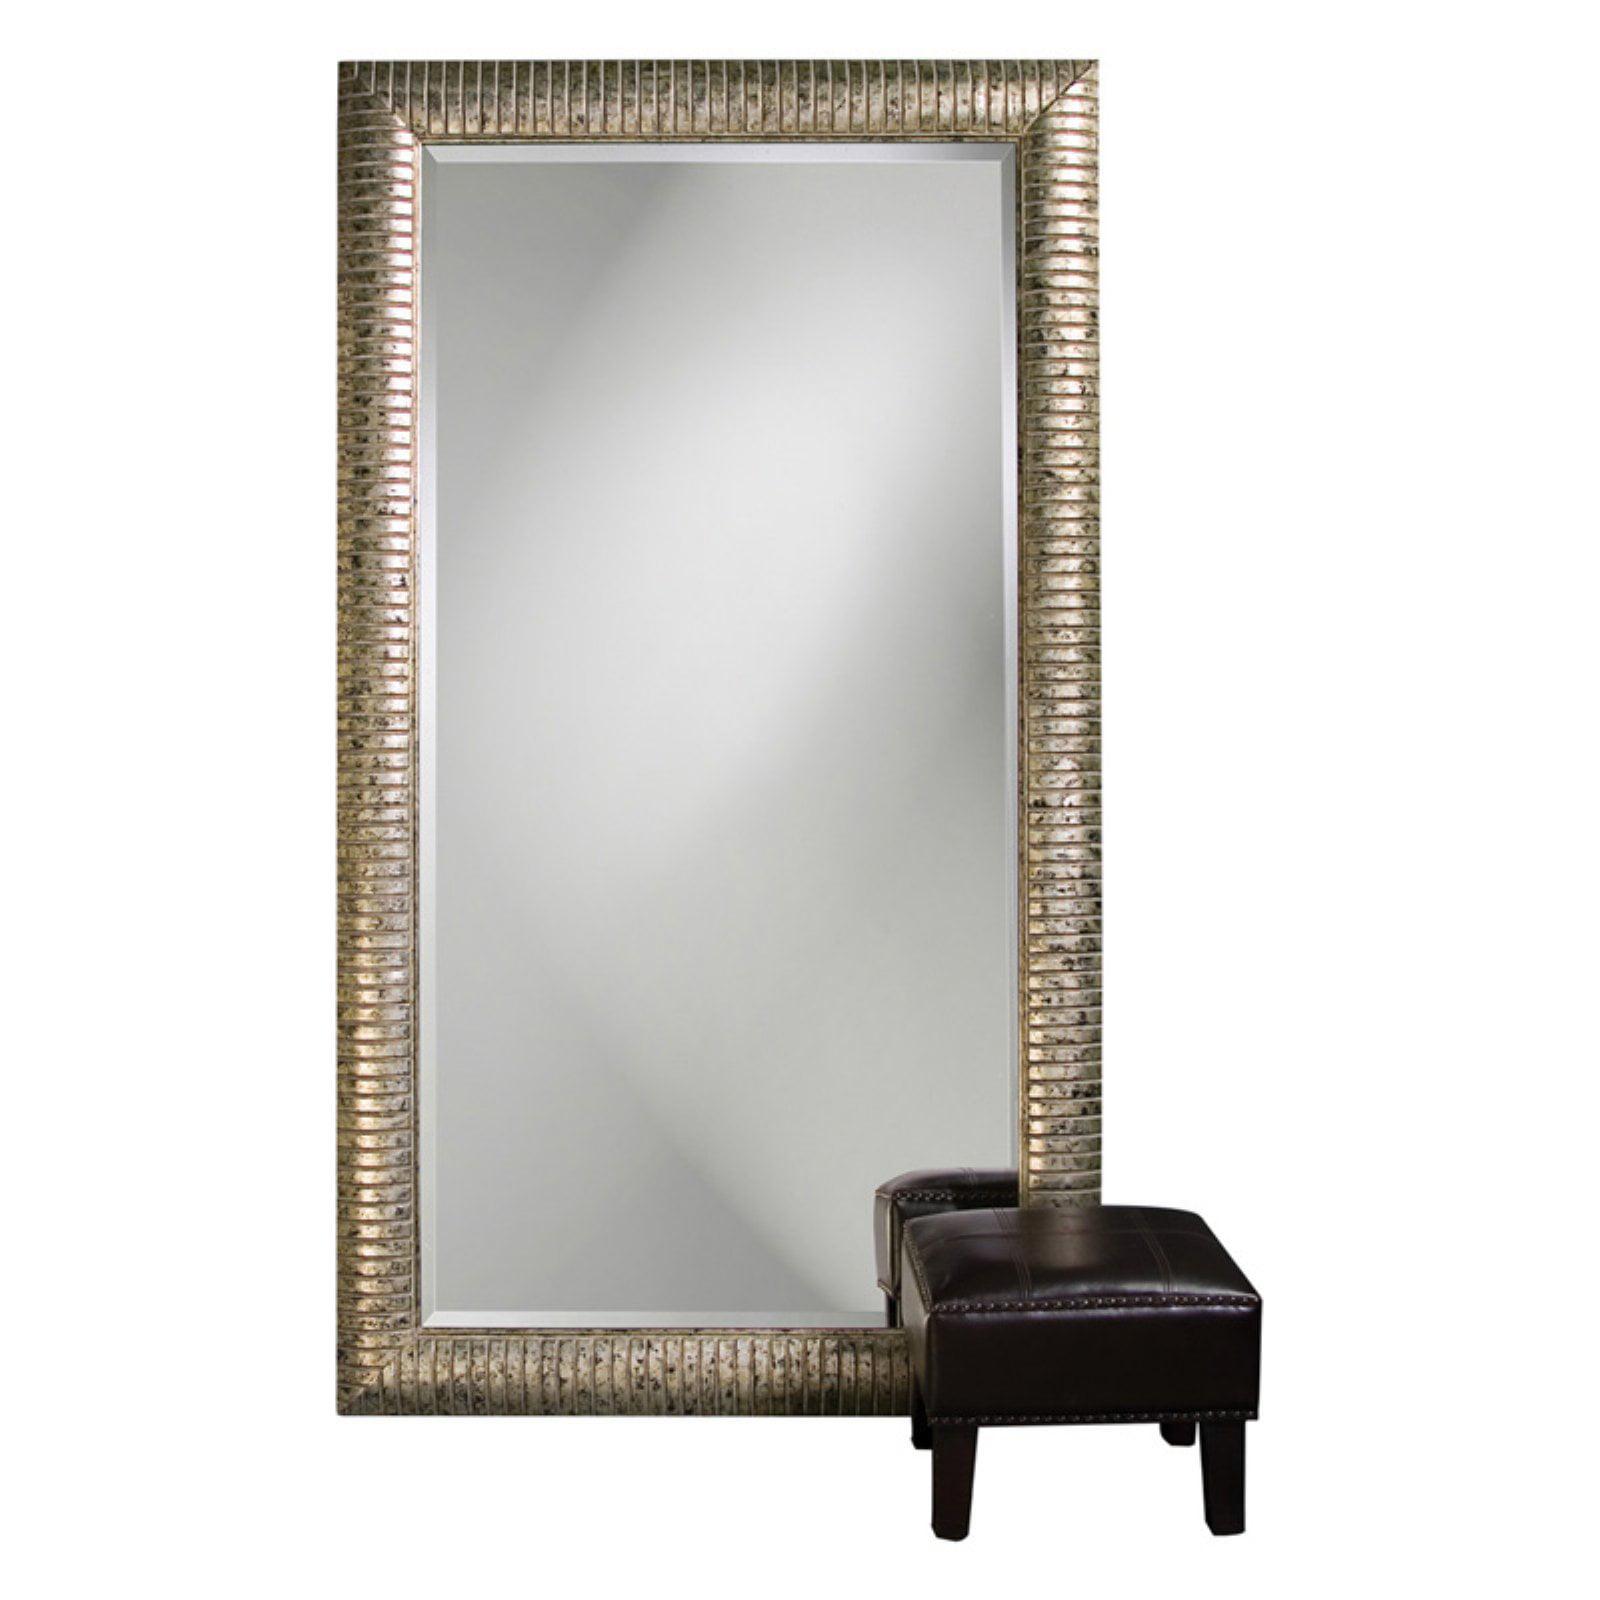 Elizabeth Austin Daniel Mottled Silver Leaf Leaning Floor Mirror 48W x 84H in. by Howard Elliott